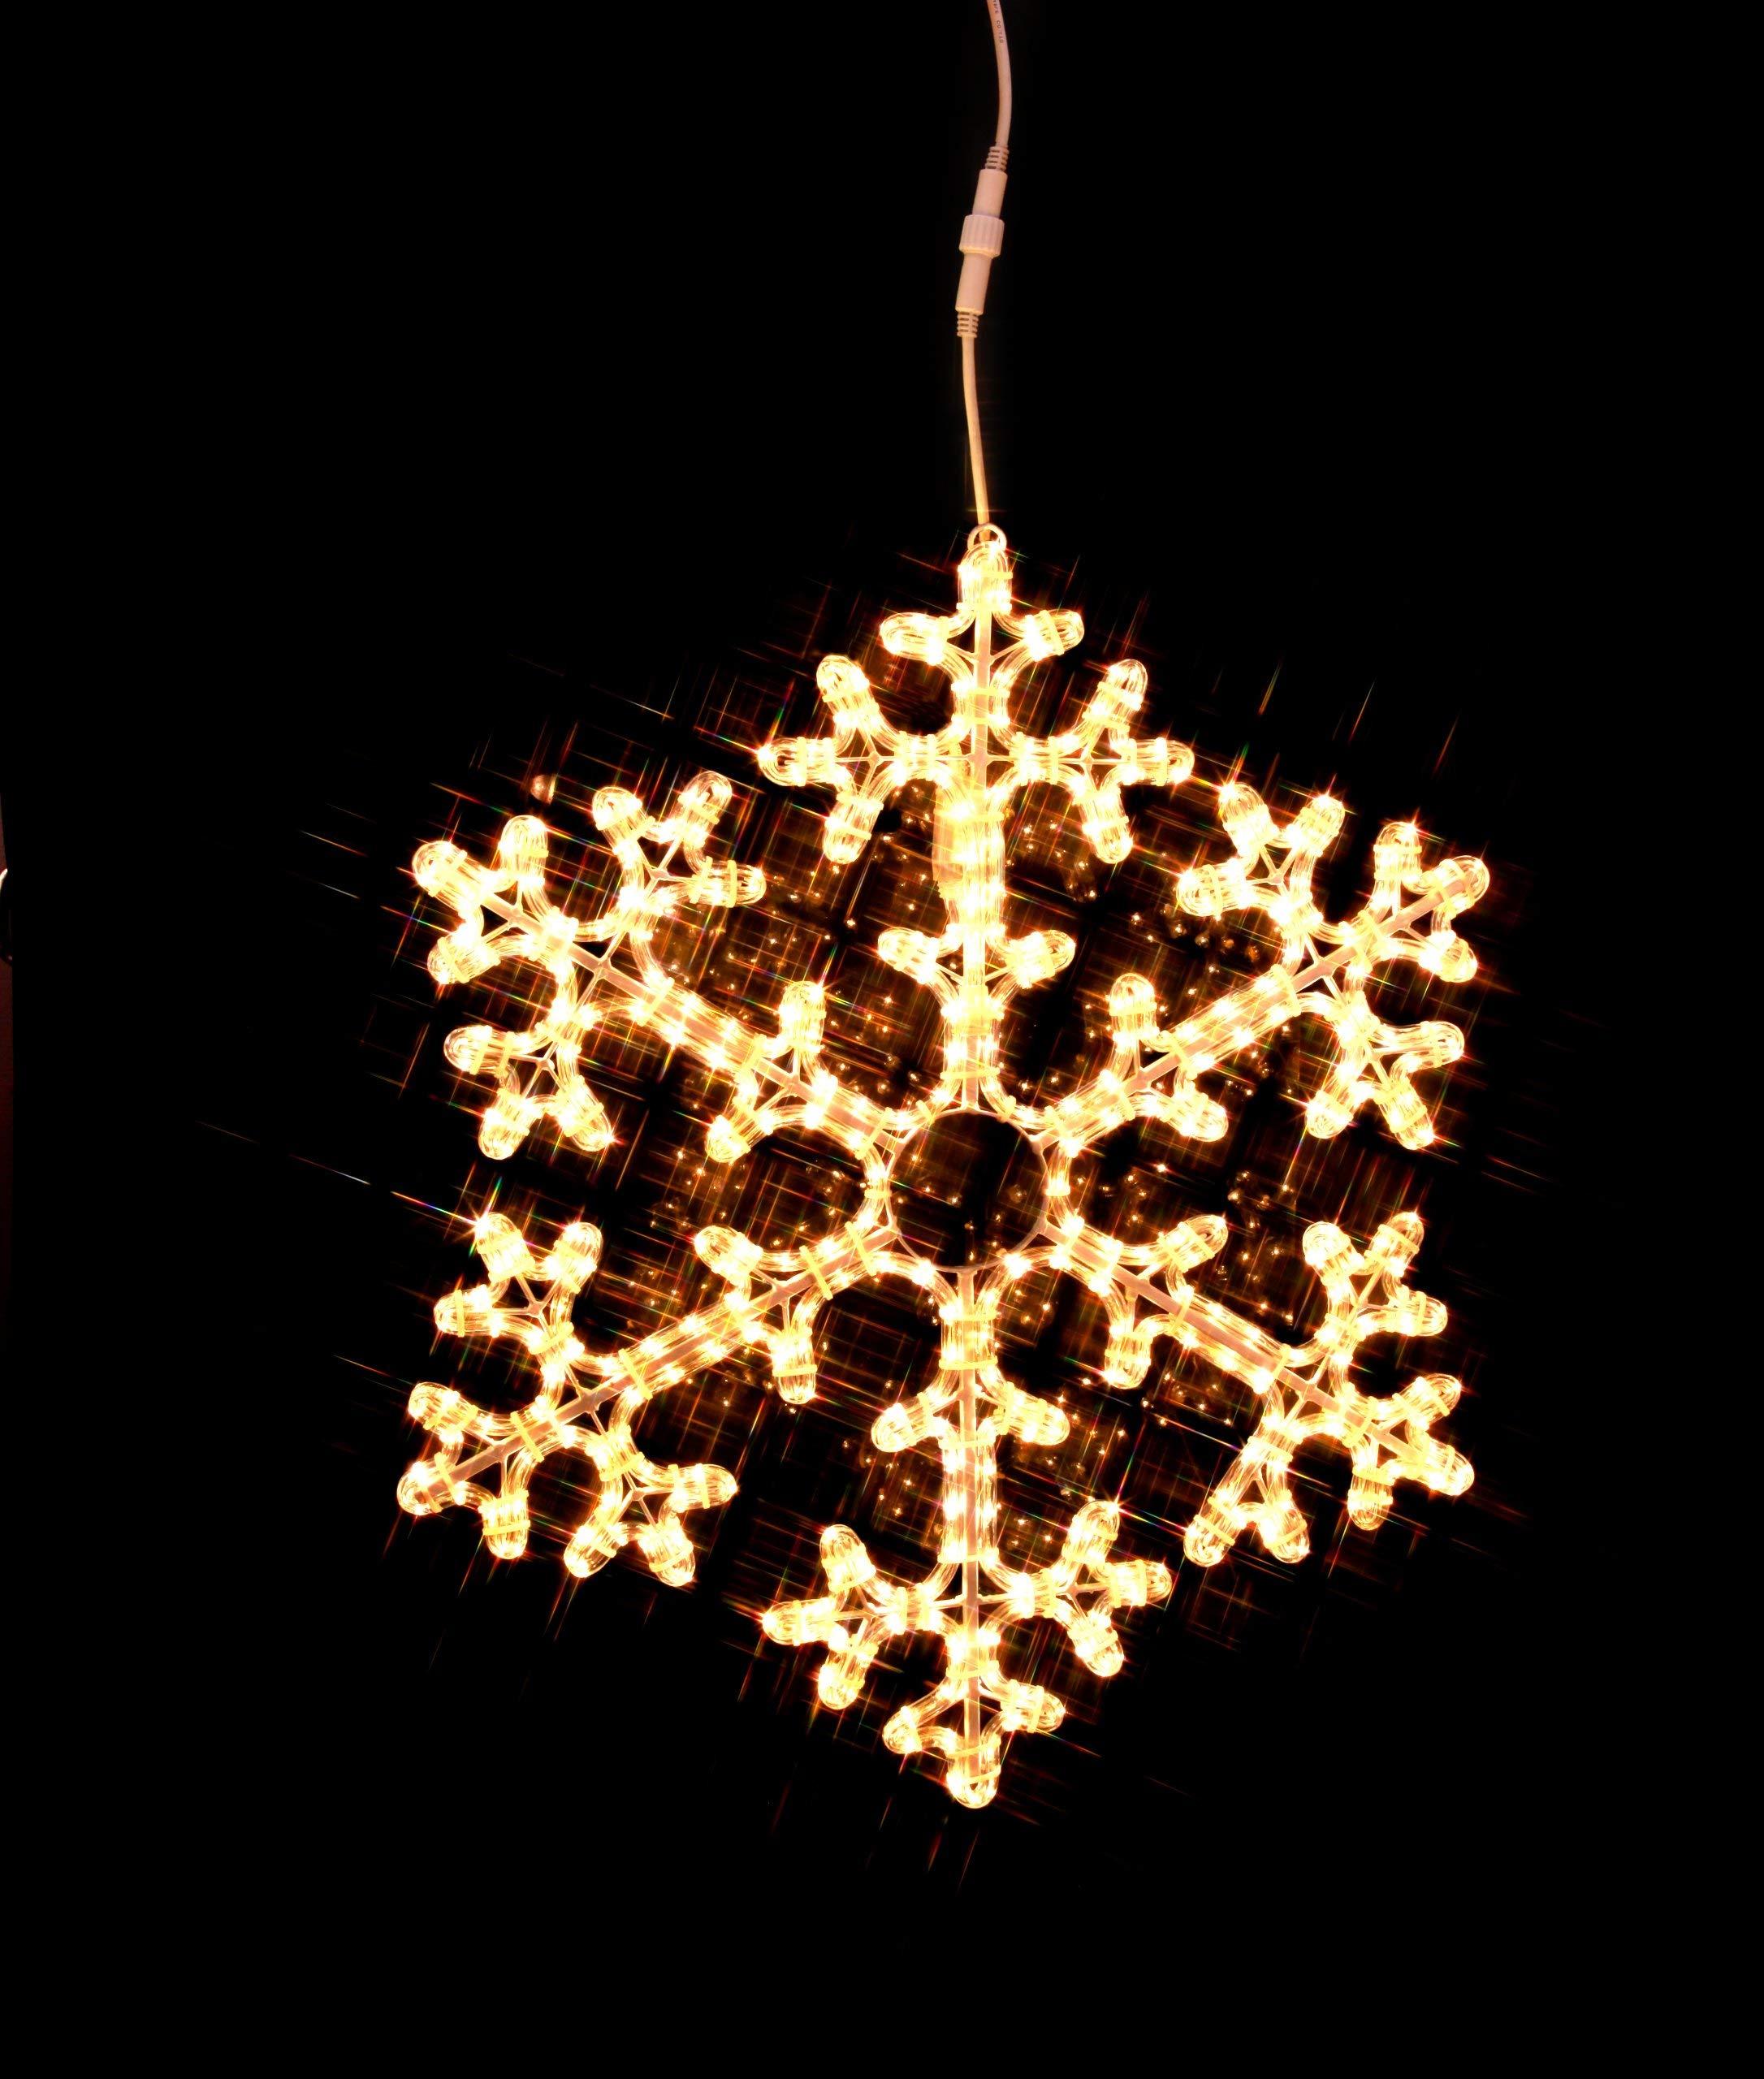 Best-Season-LED-Ropelight-Silhouette-Schneeflocke-koppelbar-Durchmesser-circa-75-cm-360-warm-wei-LED-outdoor-800-46